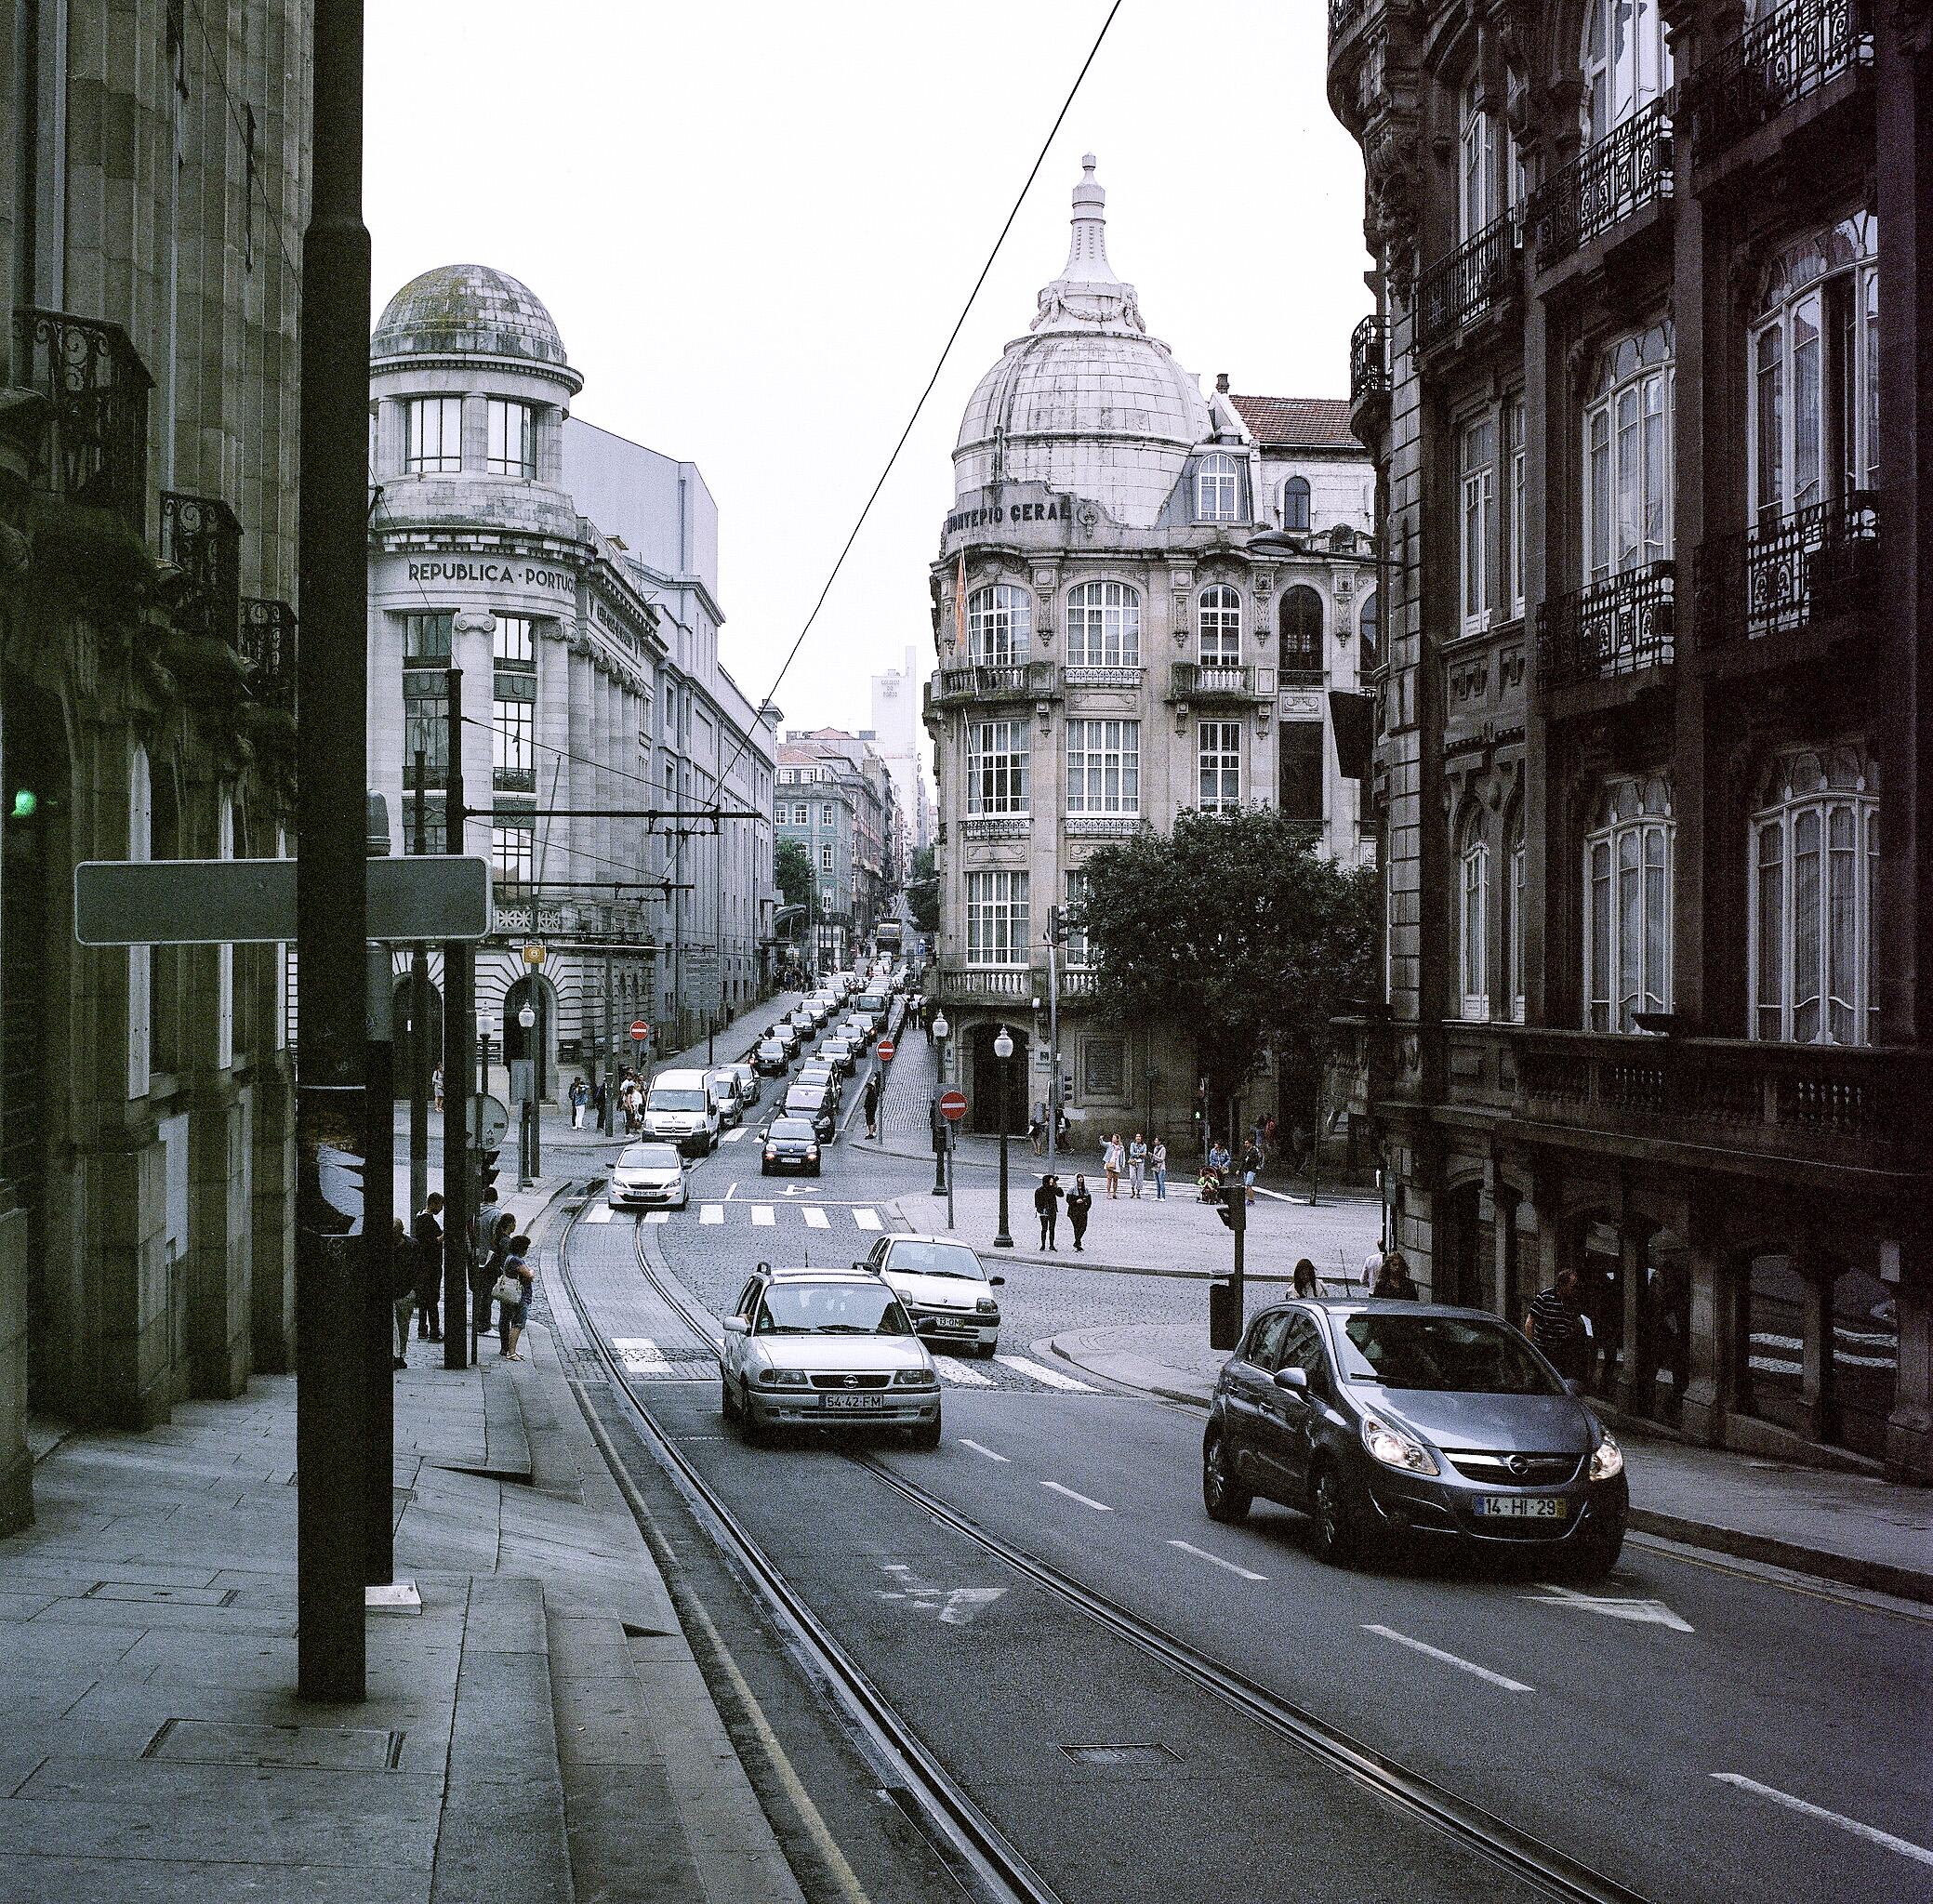 Porto, Portugal. Shot with a Hasselblad 500CM on Kodak Portra 400